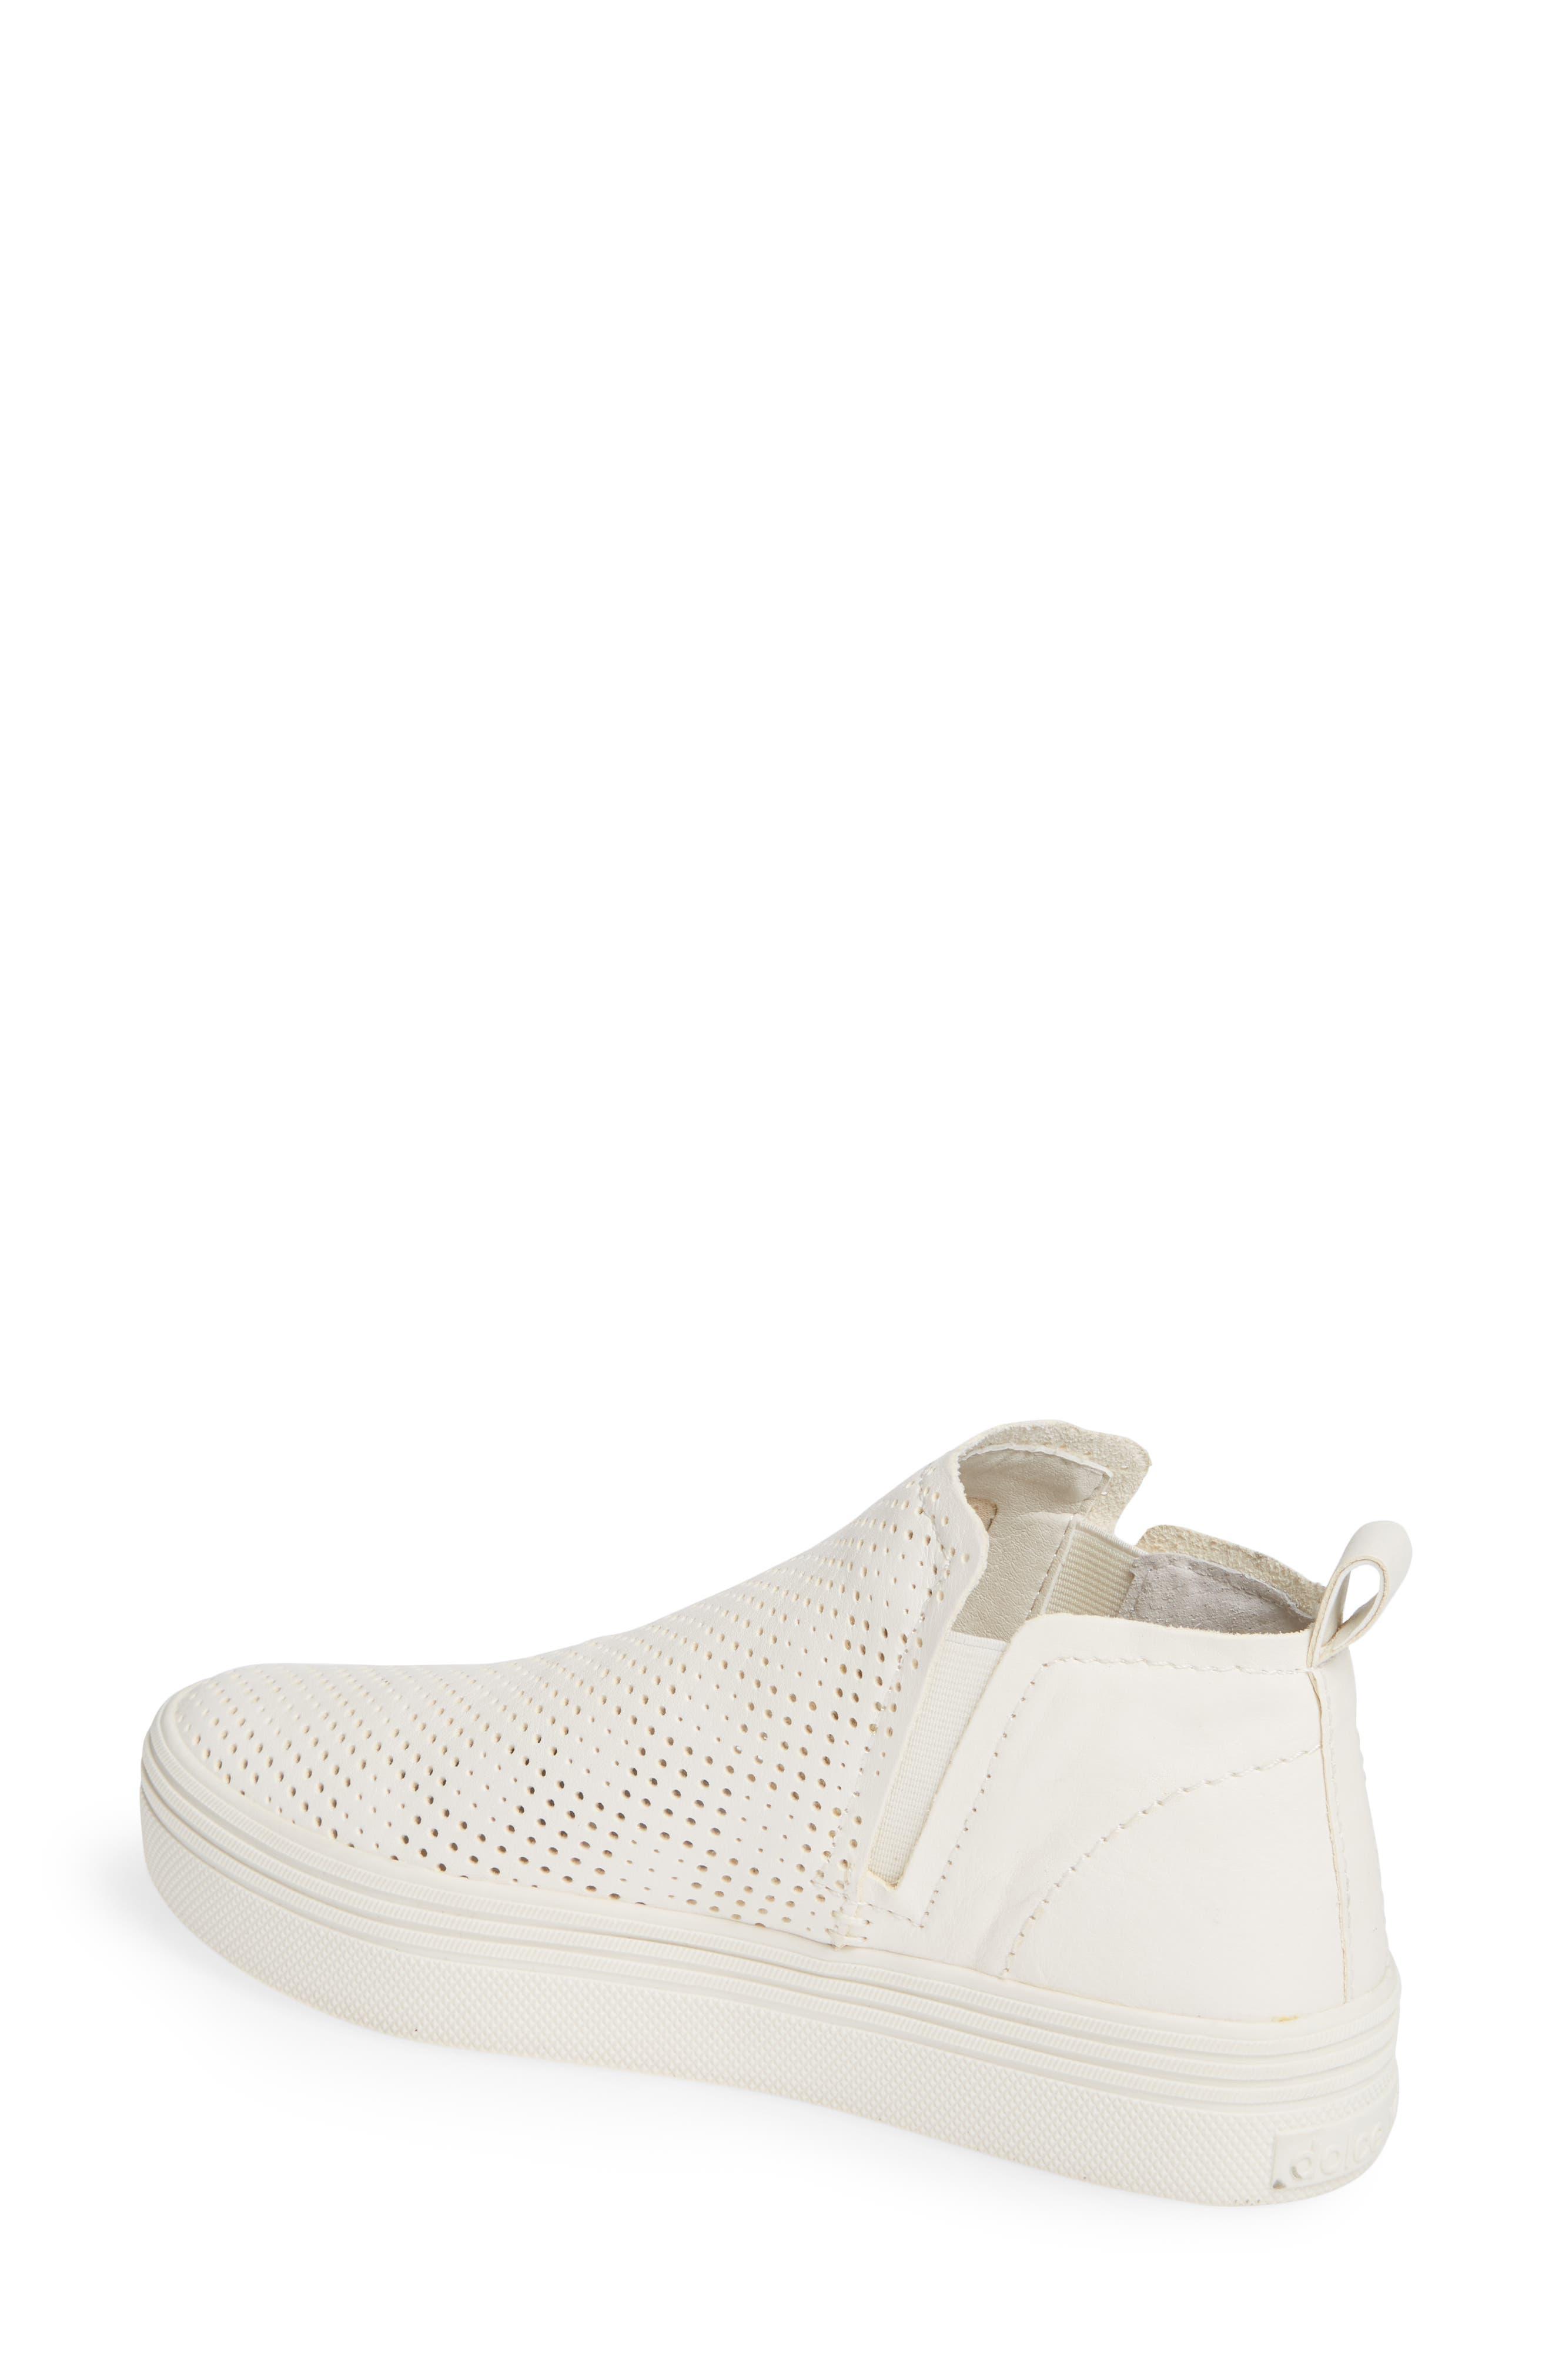 Tate Sneaker,                             Alternate thumbnail 2, color,                             WHITE